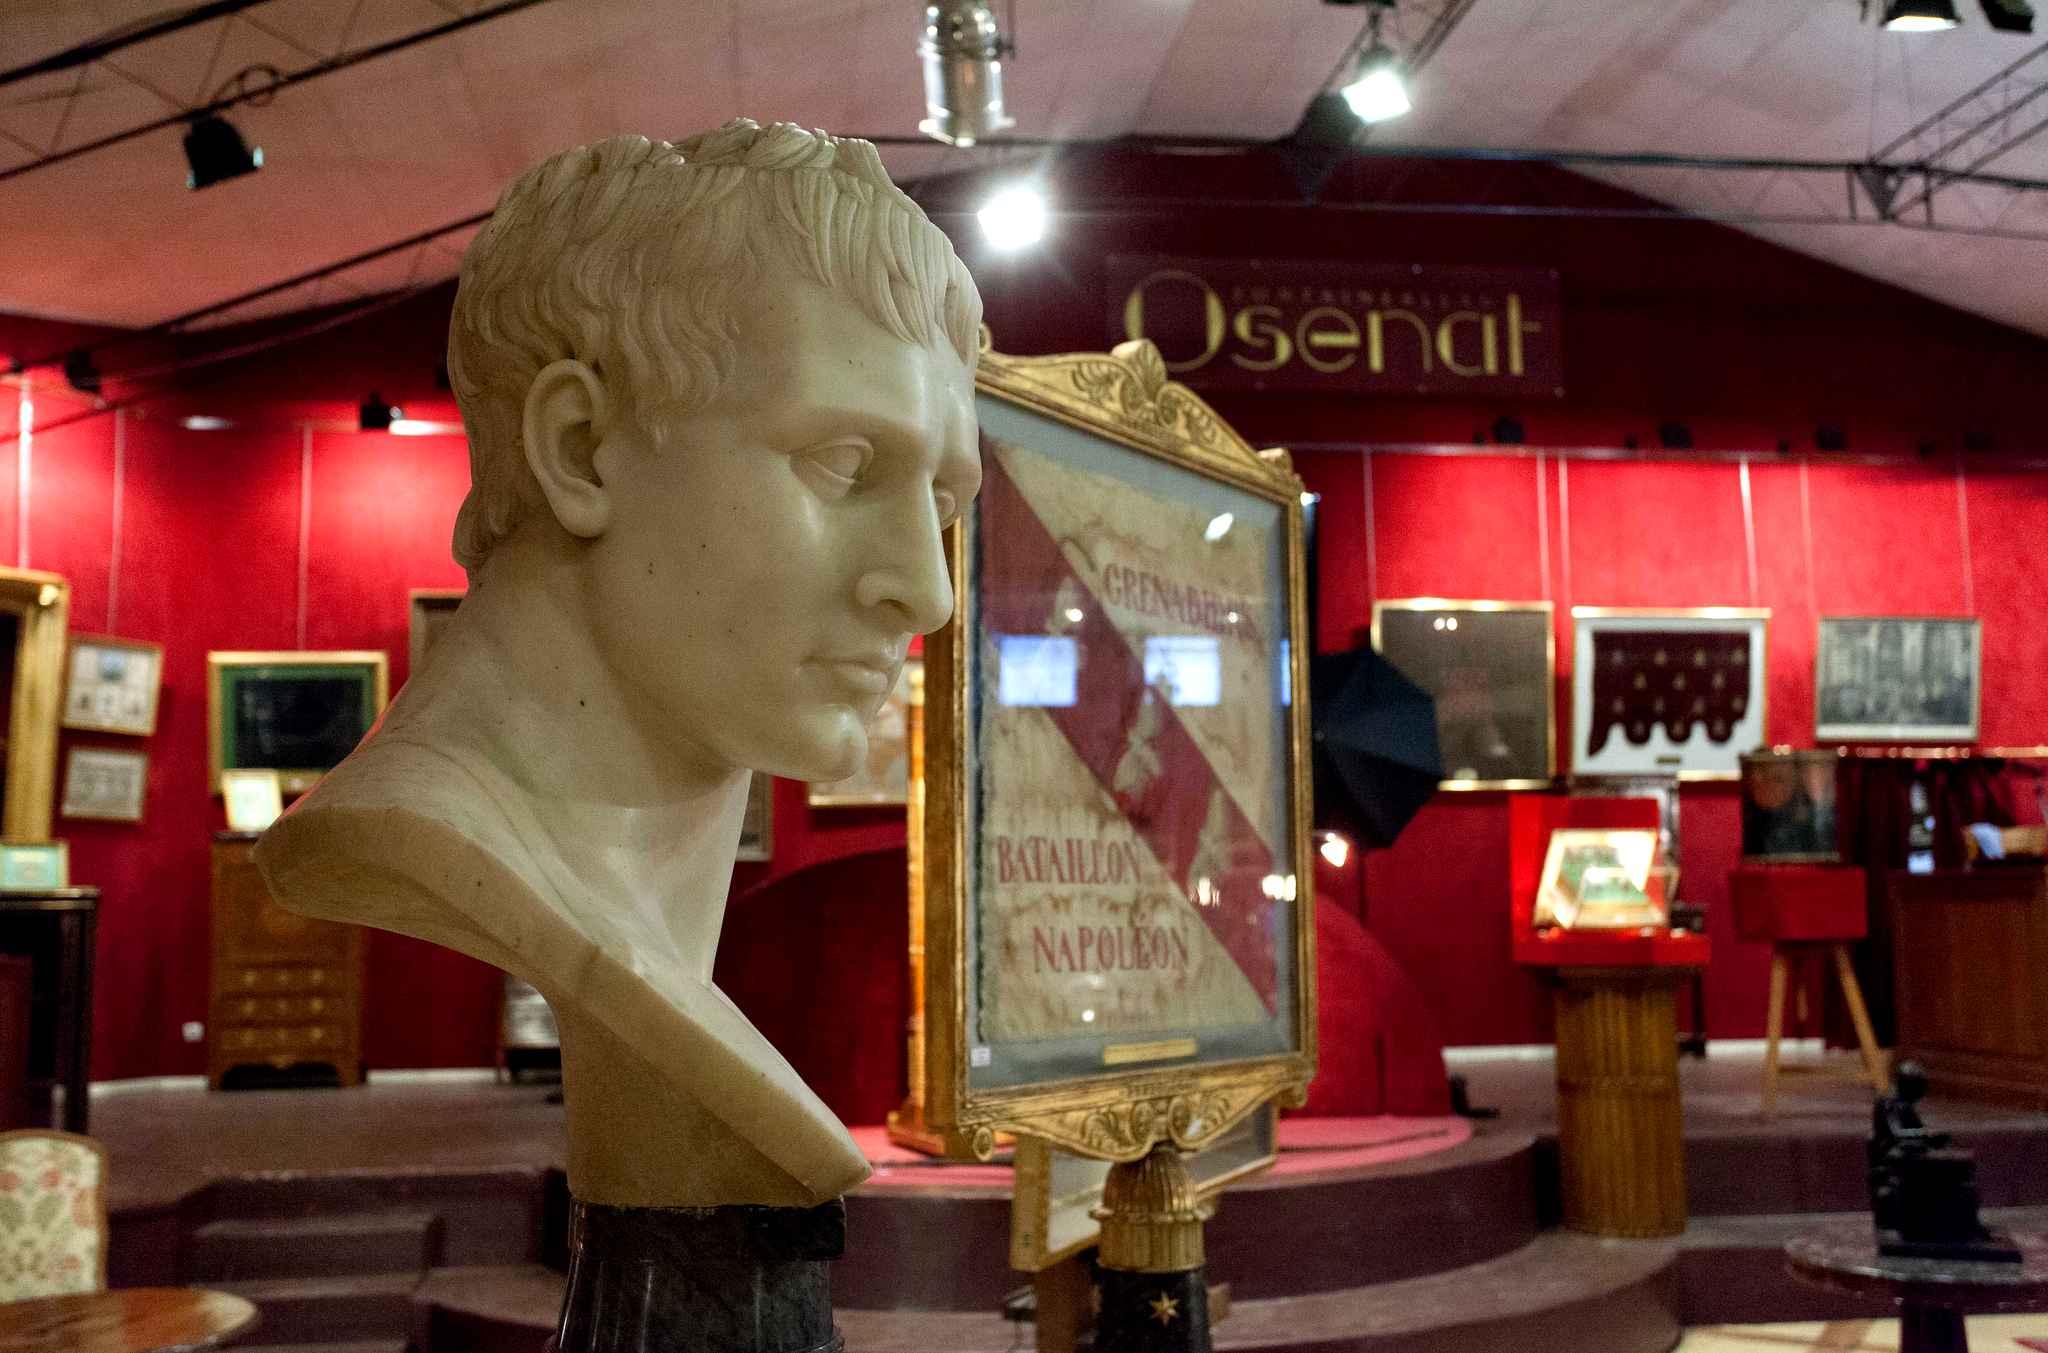 Buste de Napoléon, maison de ventes Osenat, image ©Osent